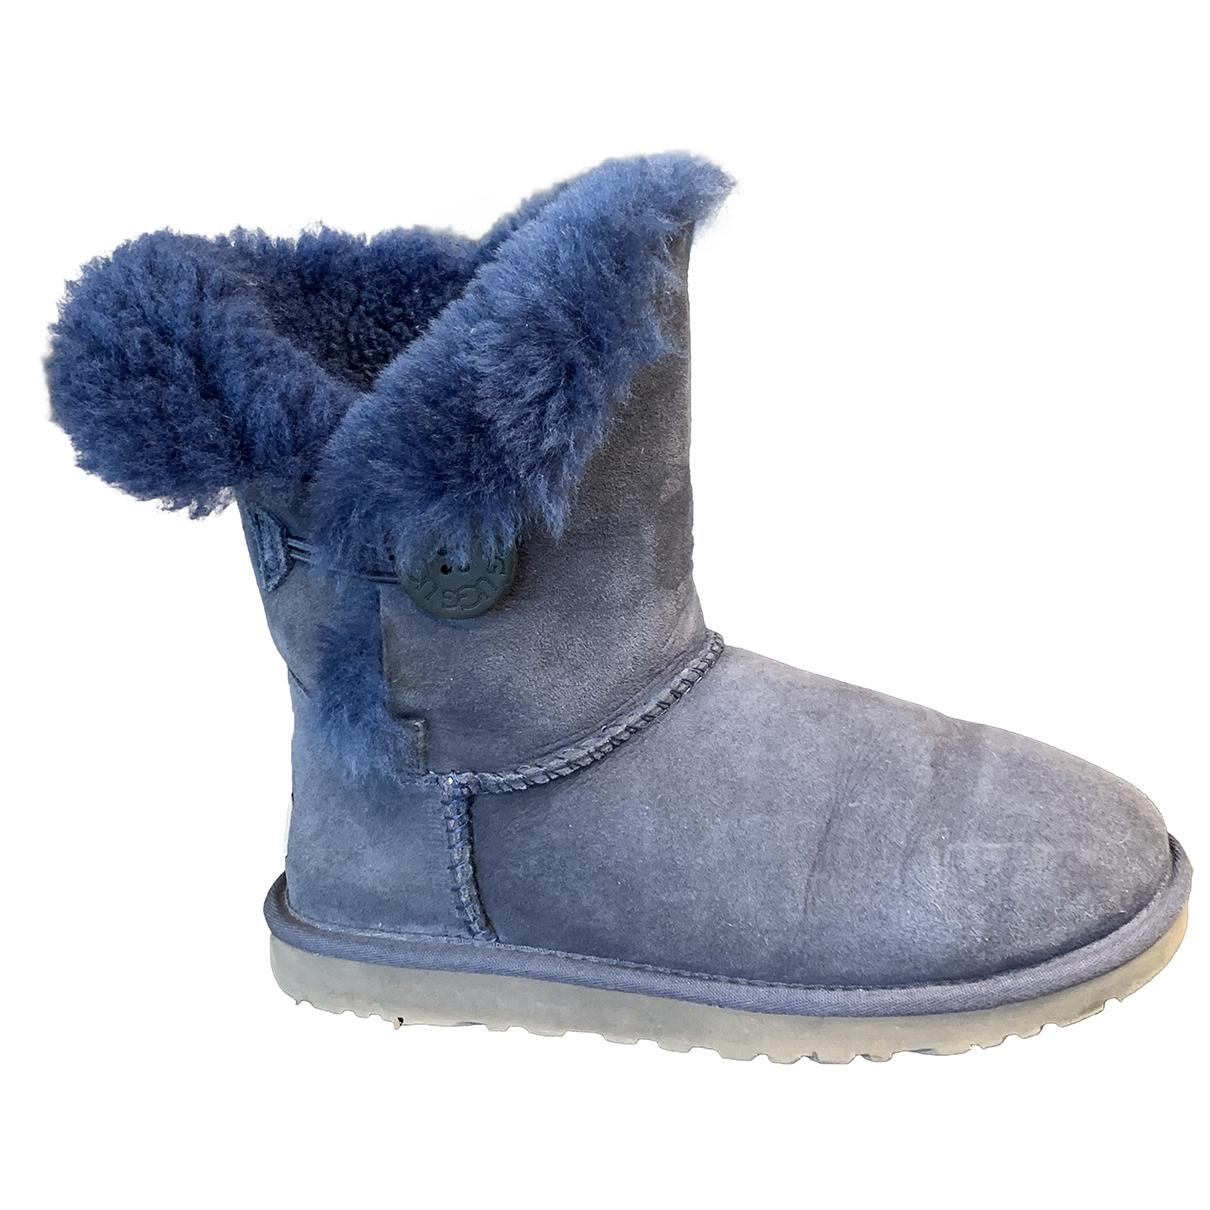 Ugg - Bottes   pour femme en mouton - bleu